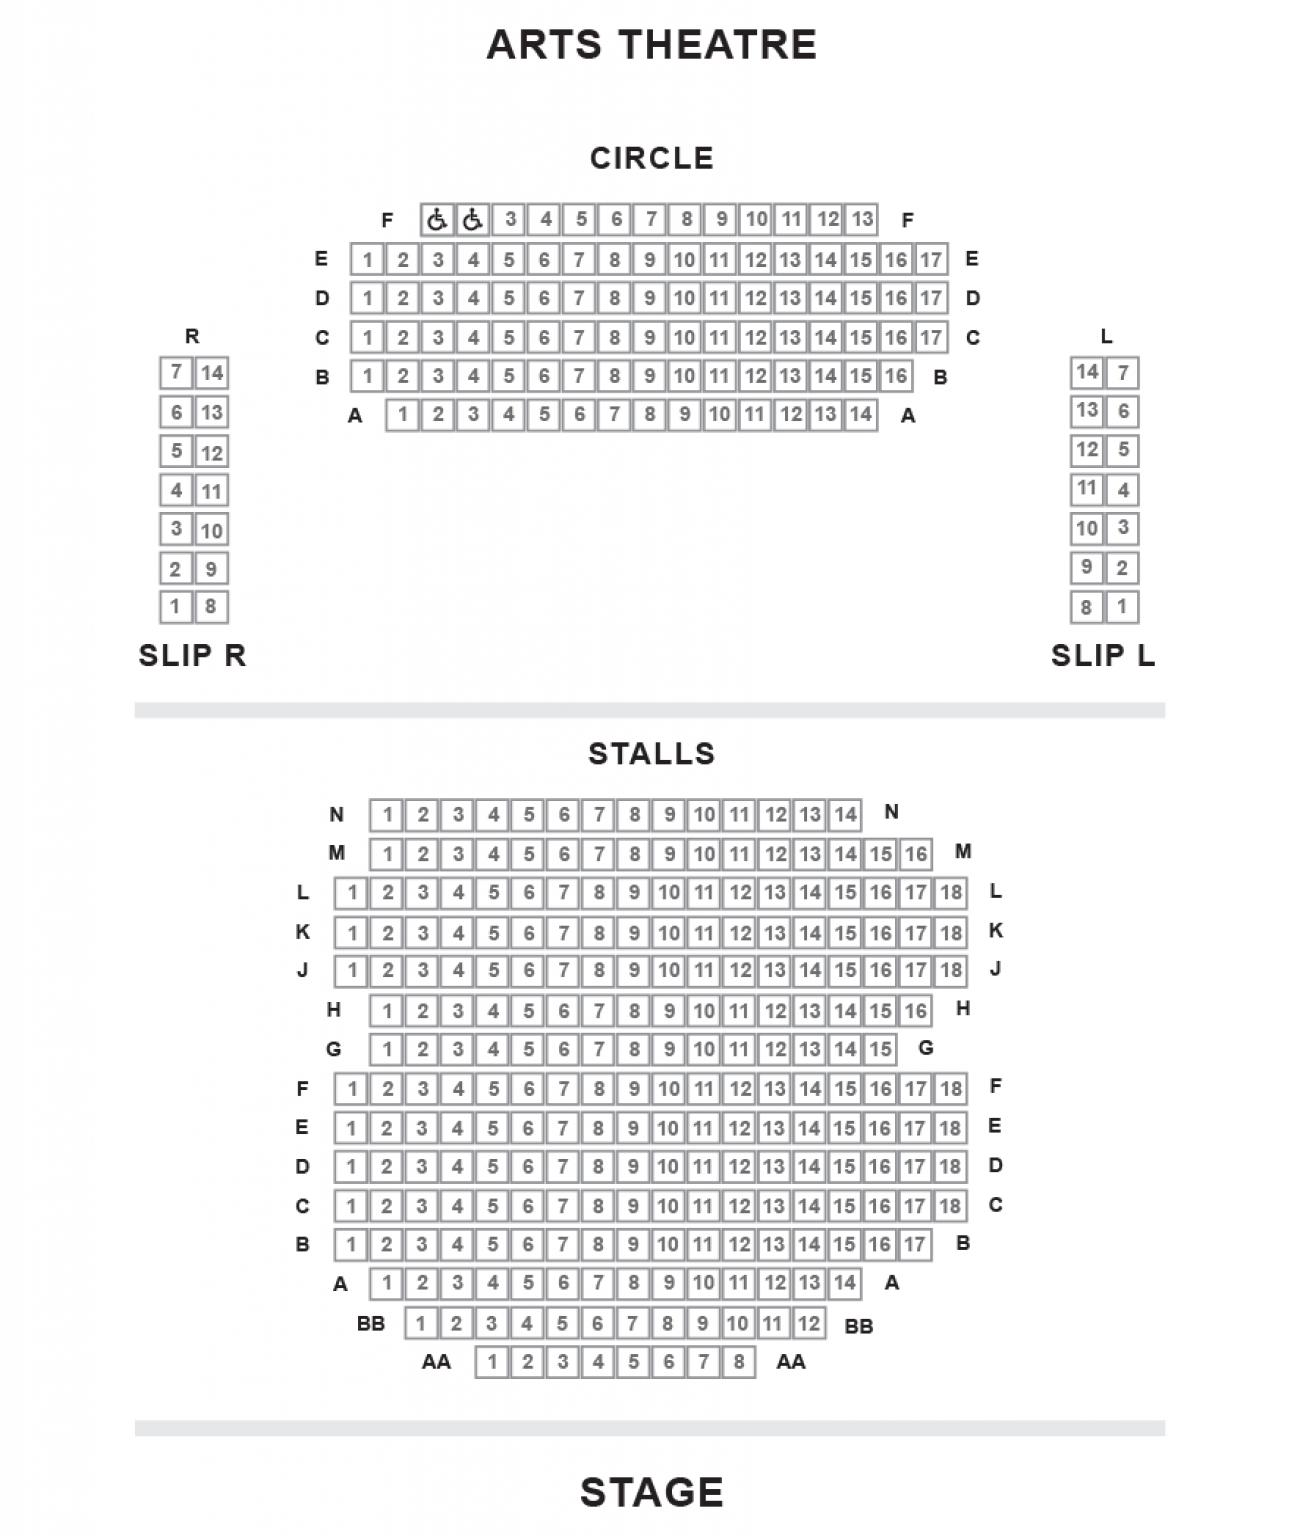 Arts Theatre